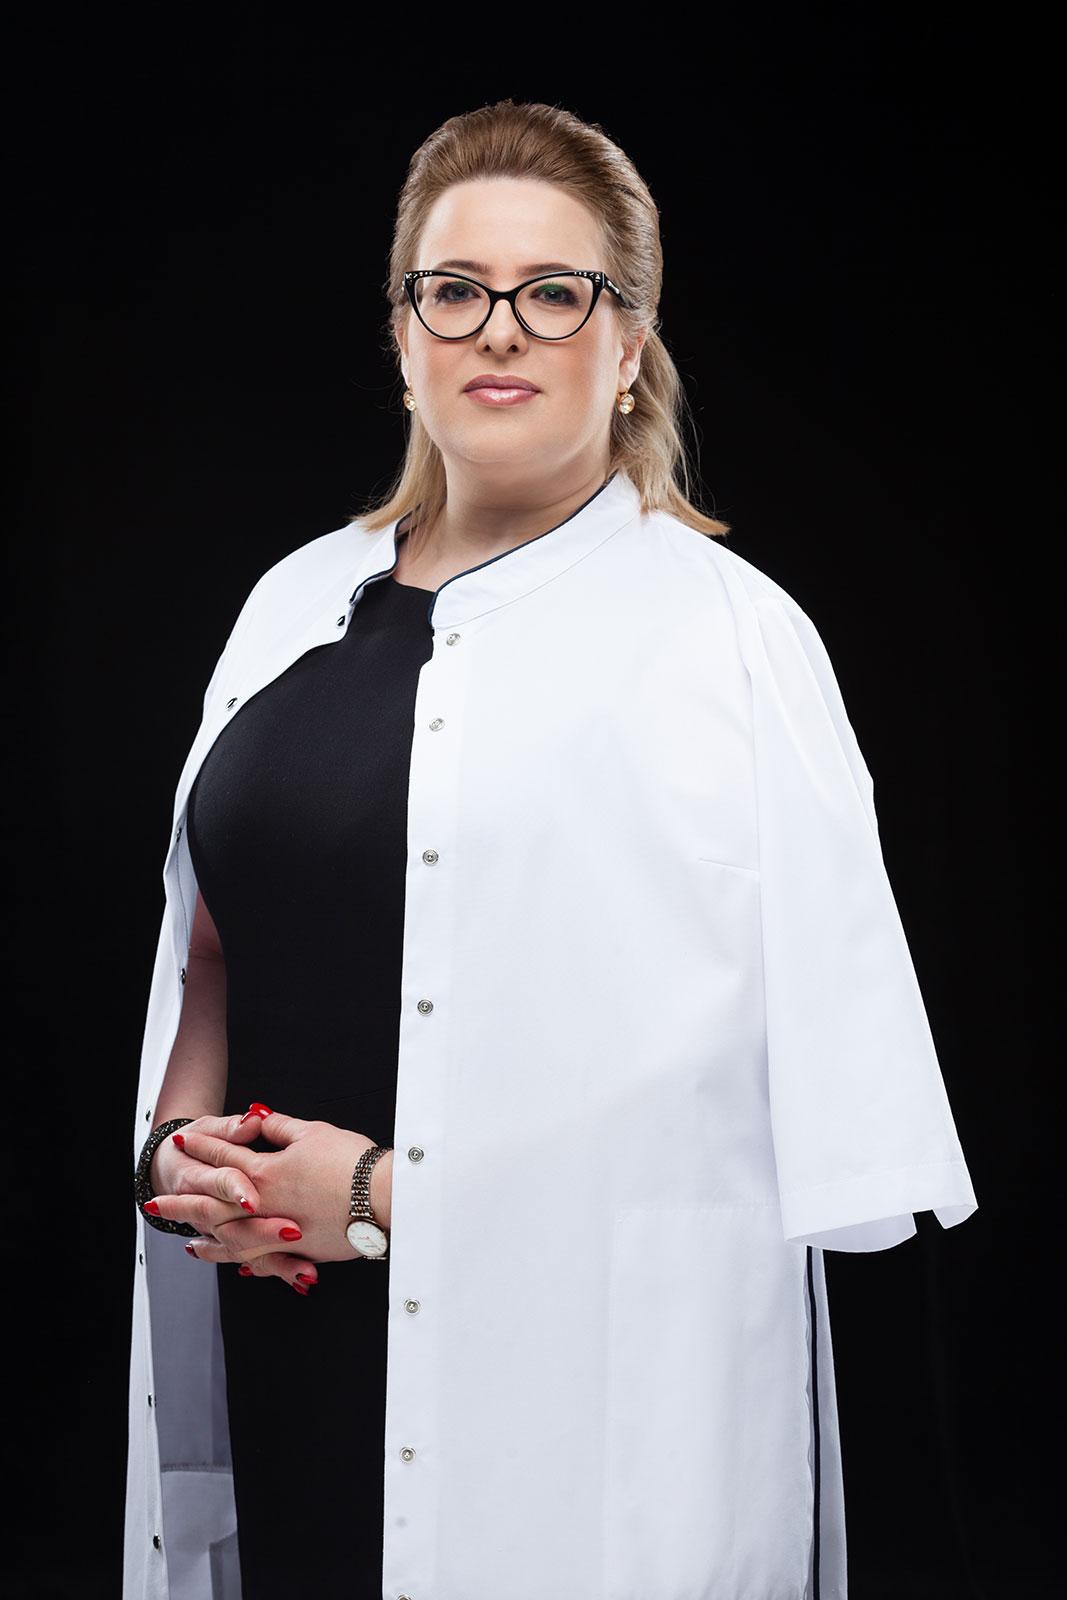 Julia Kudrjavtseva